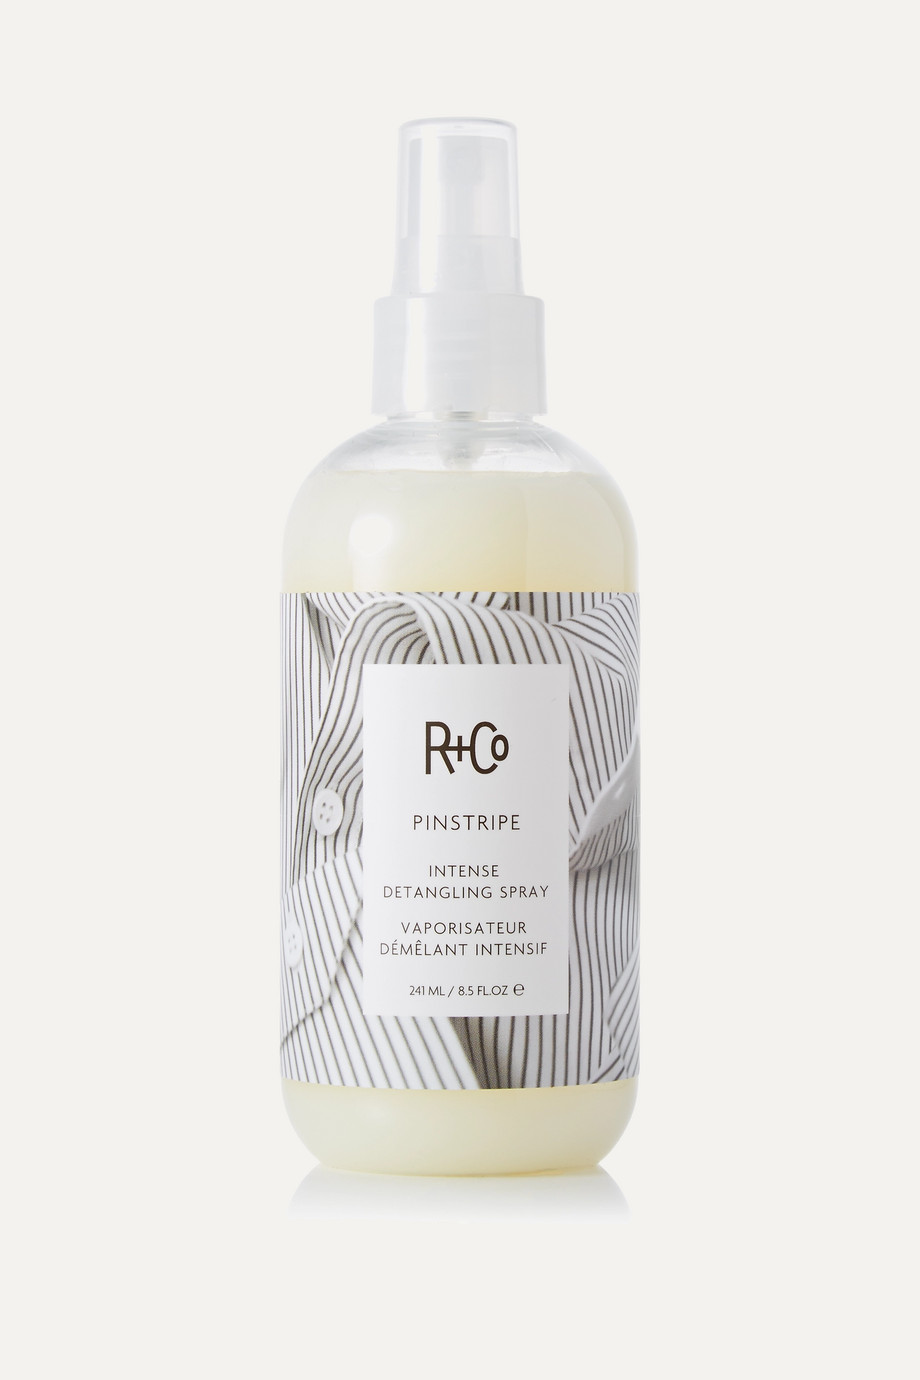 R+Co Pinstripe Intense Detangling Spray, 241ml